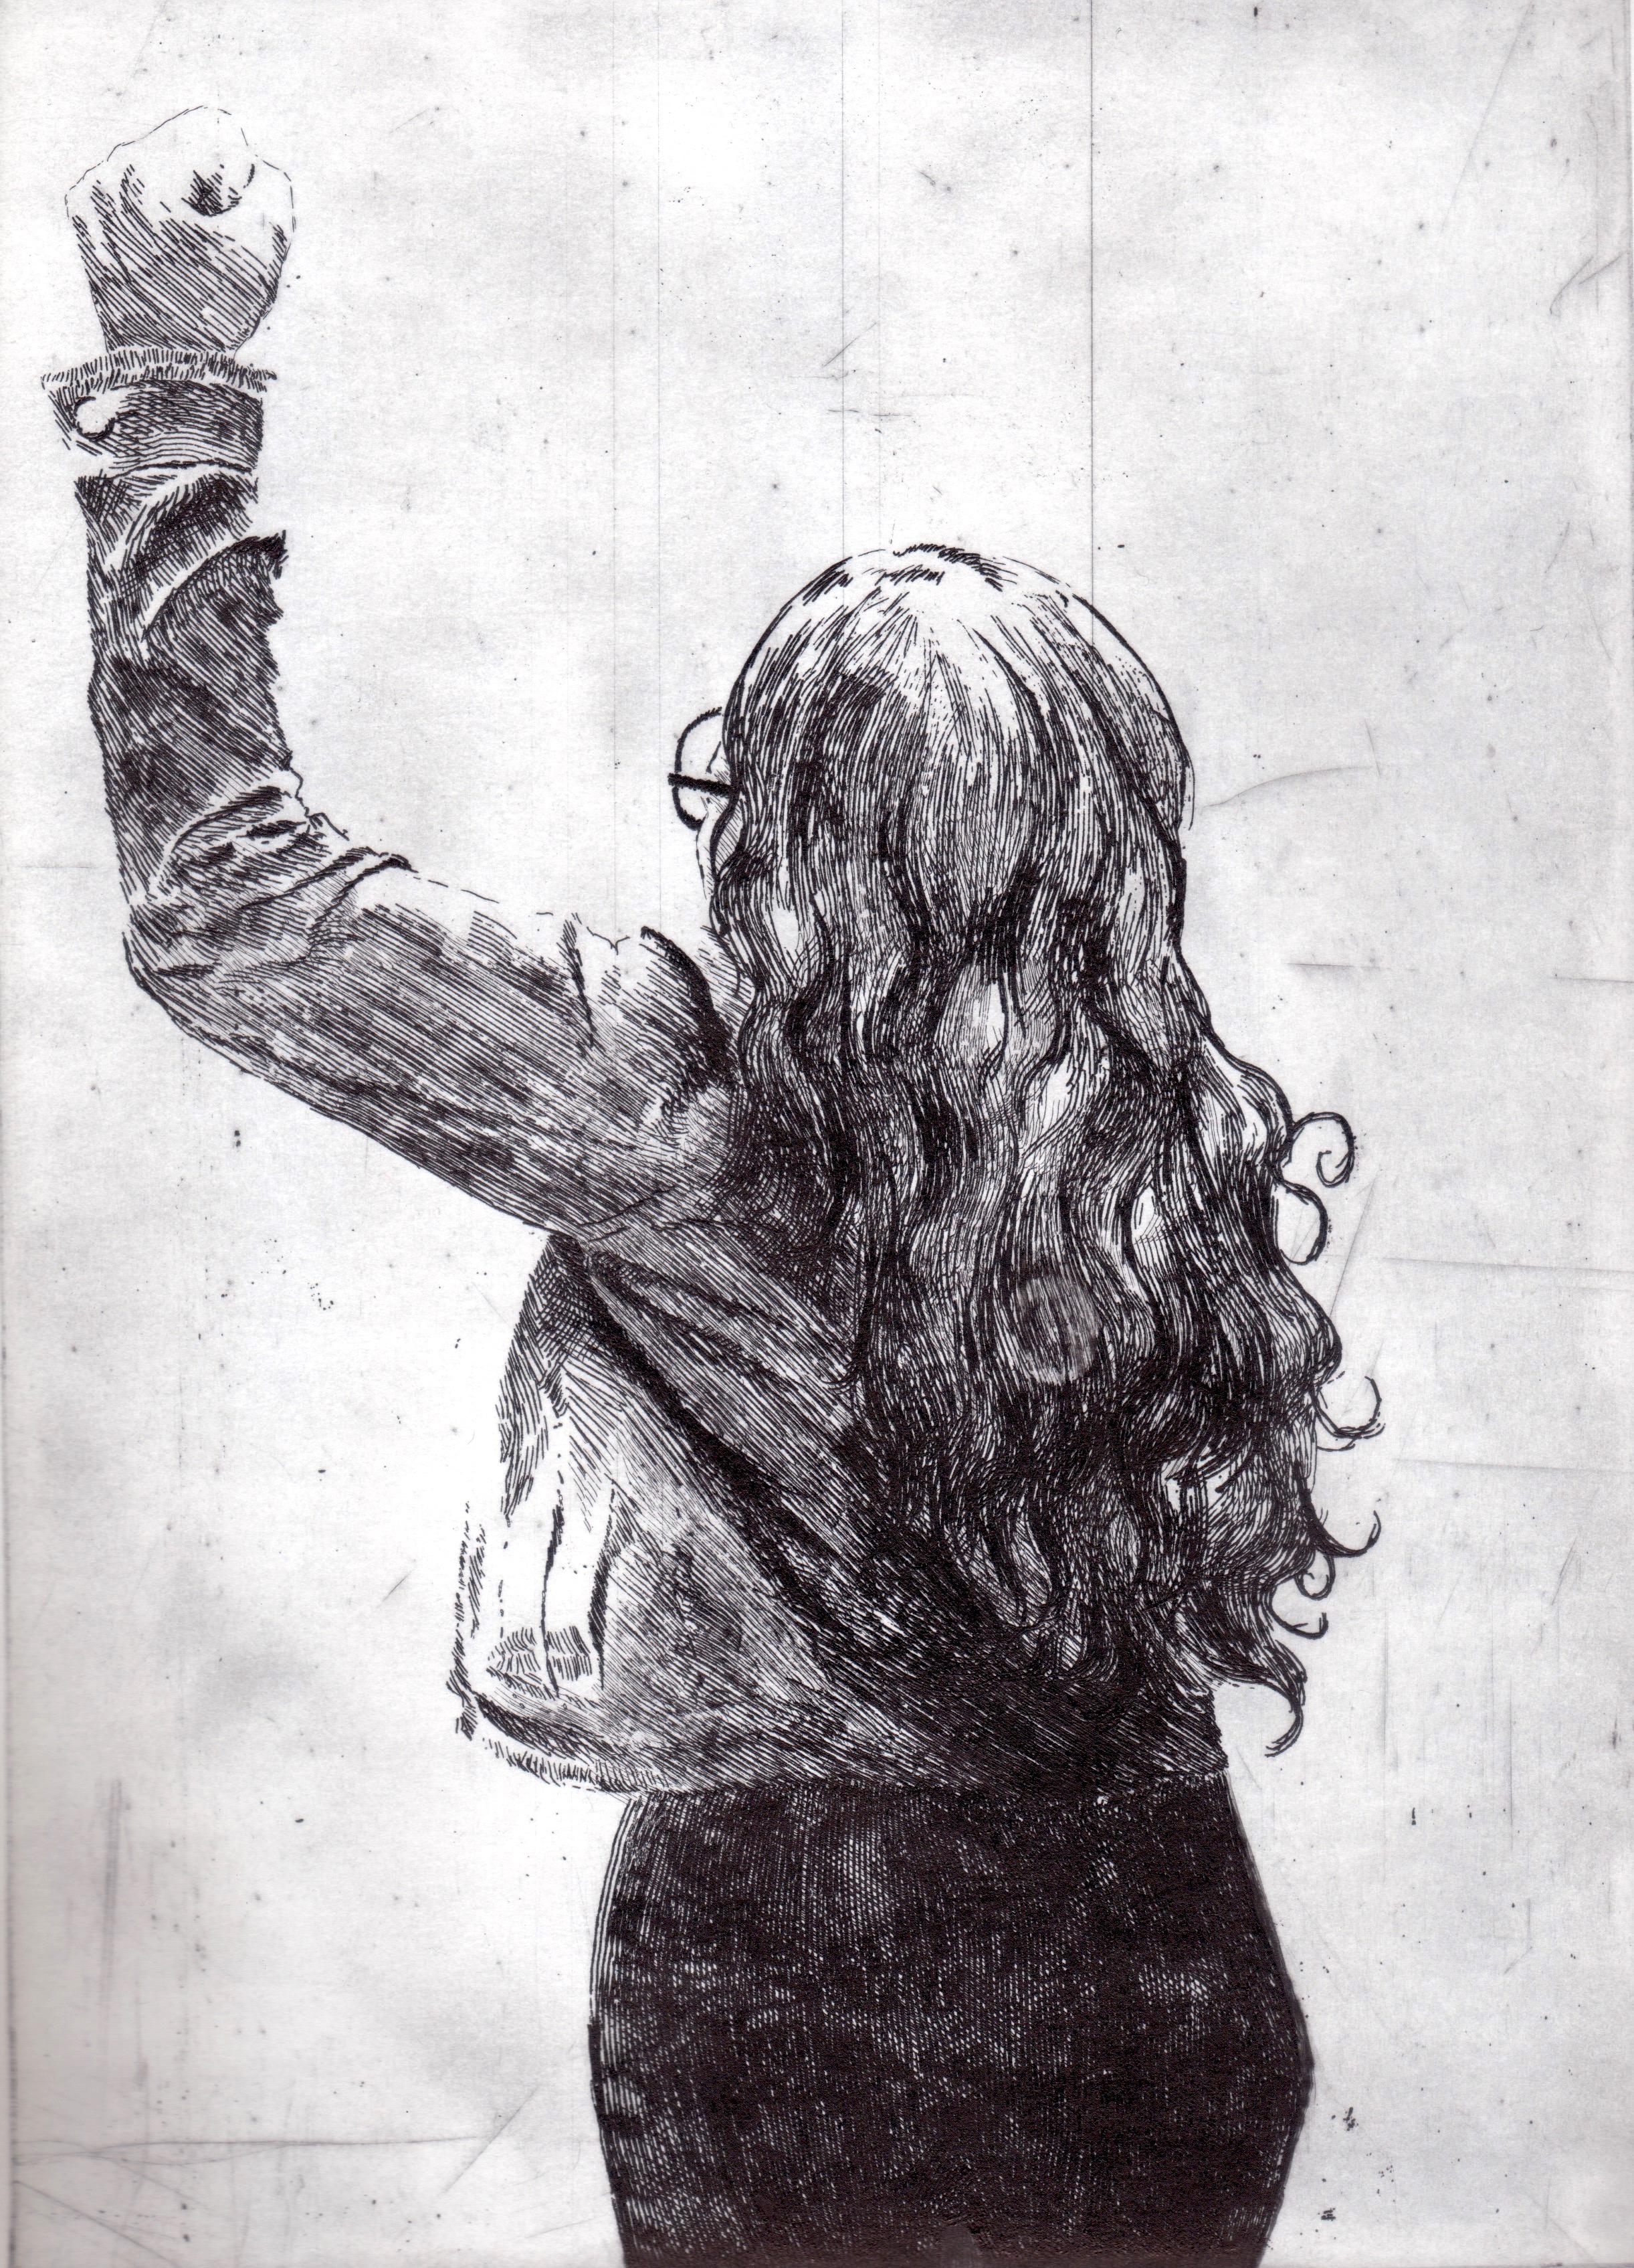 """Caminando Libre"", Aguafuerte"